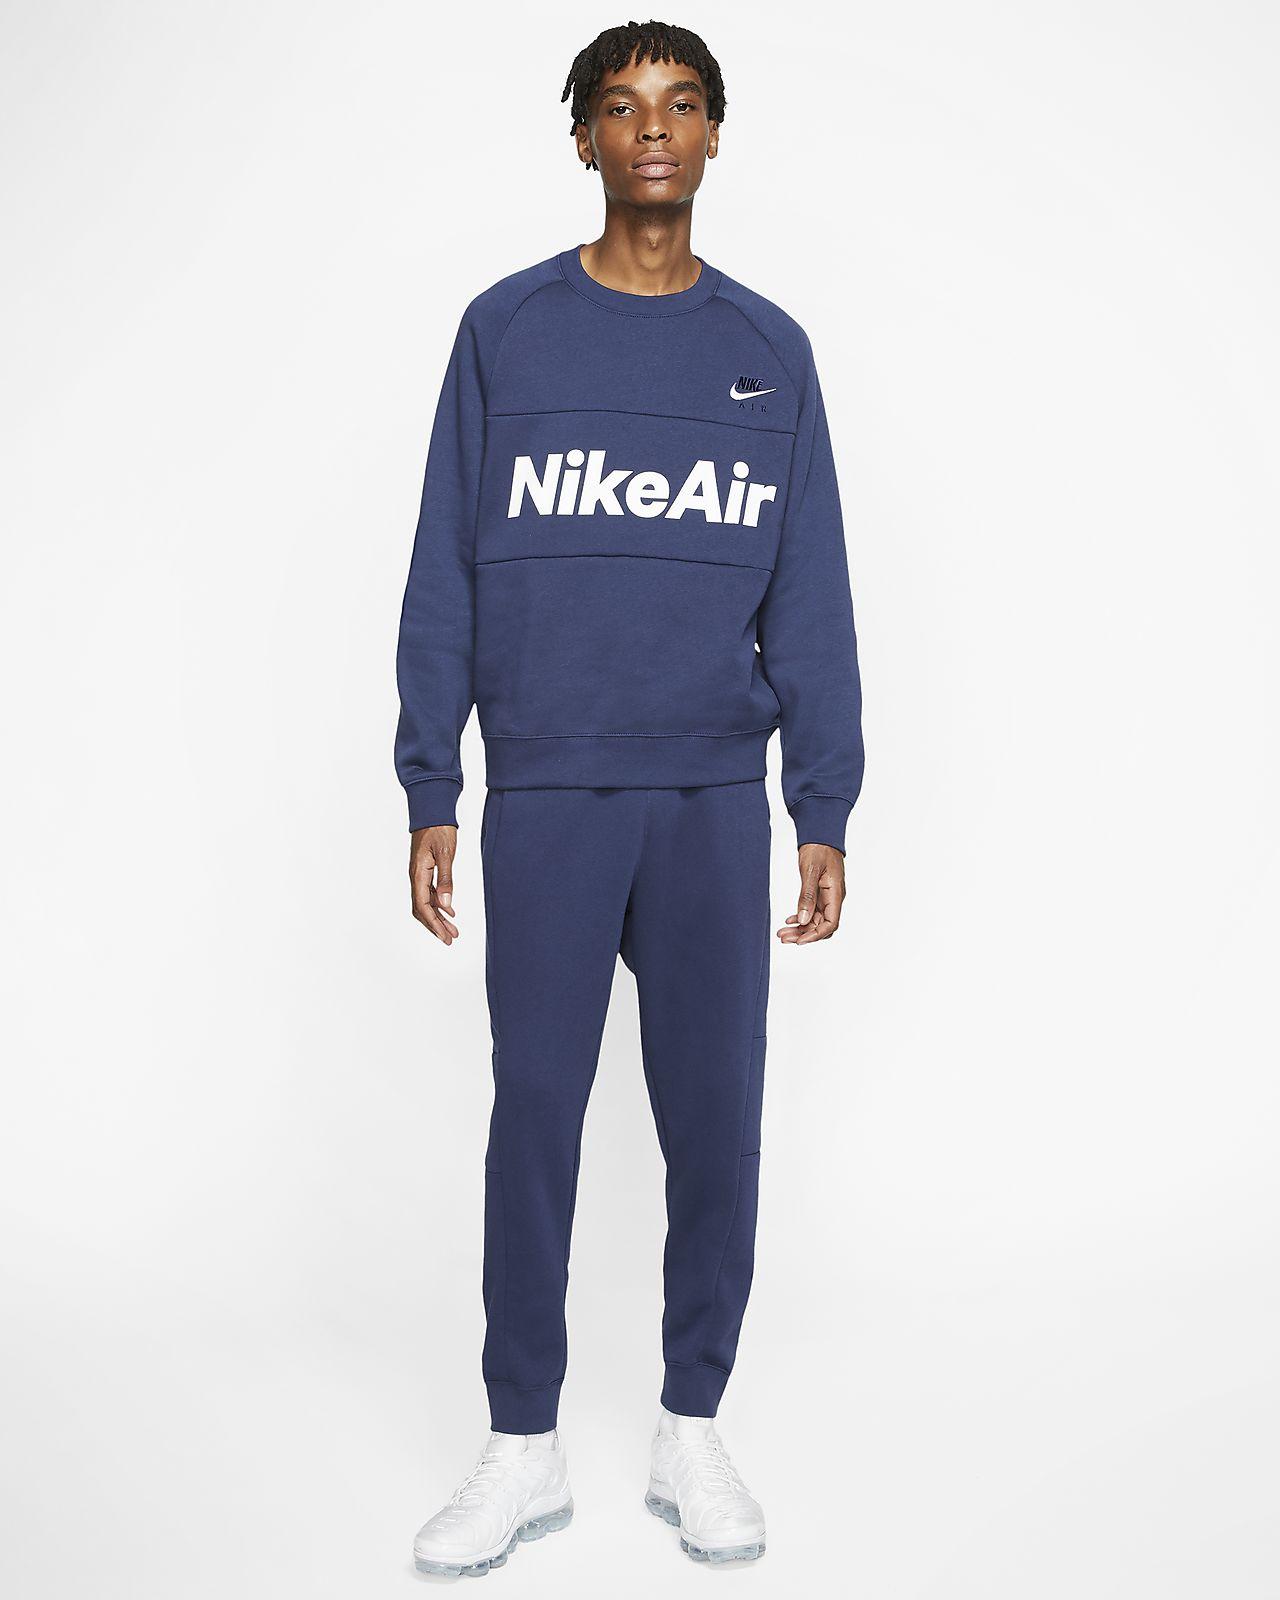 Nike Air fleecebukser til mænd